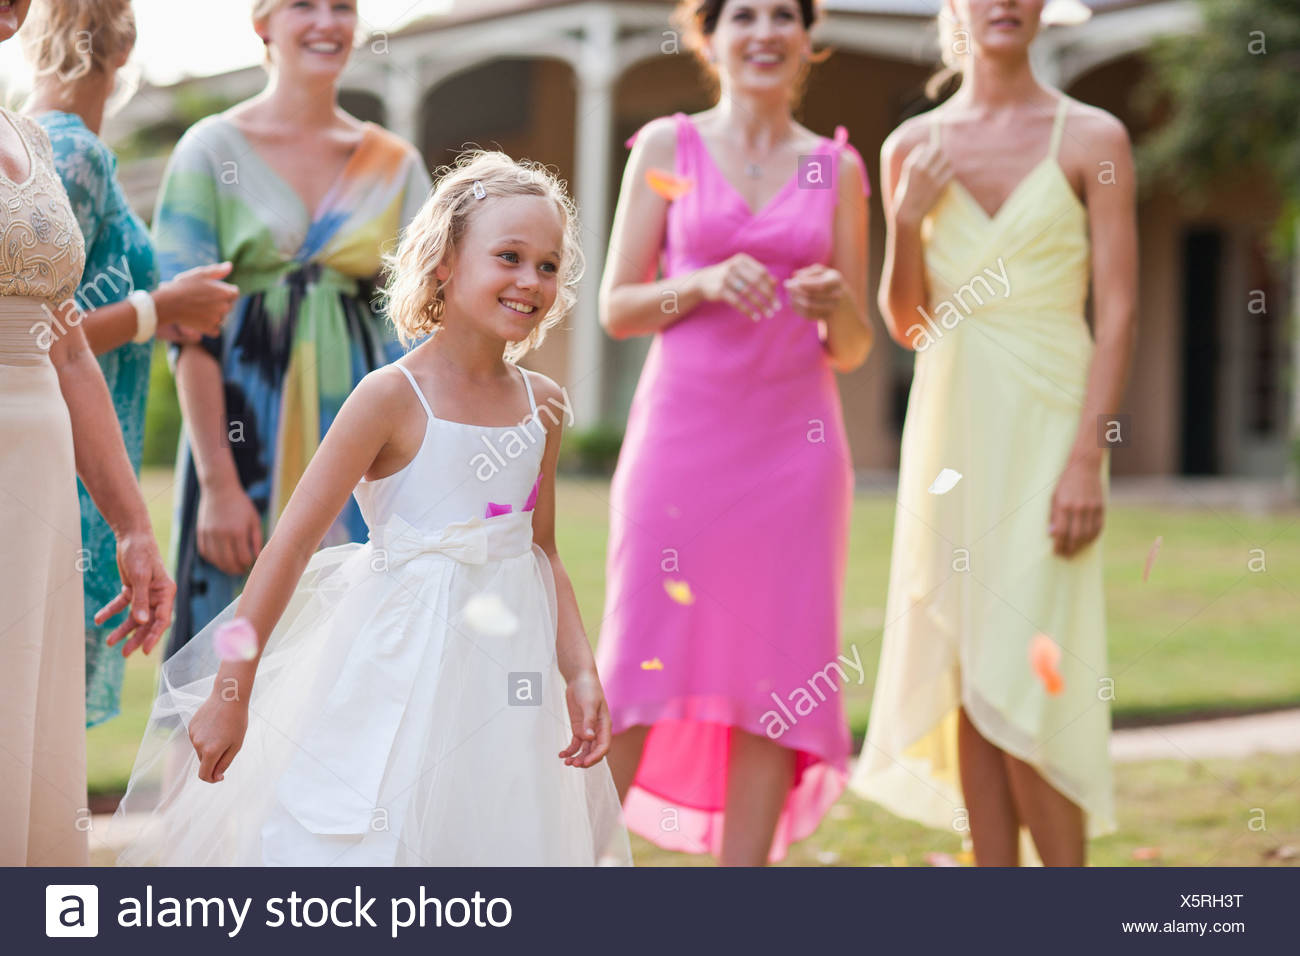 Flower girl at wedding reception - Stock Image